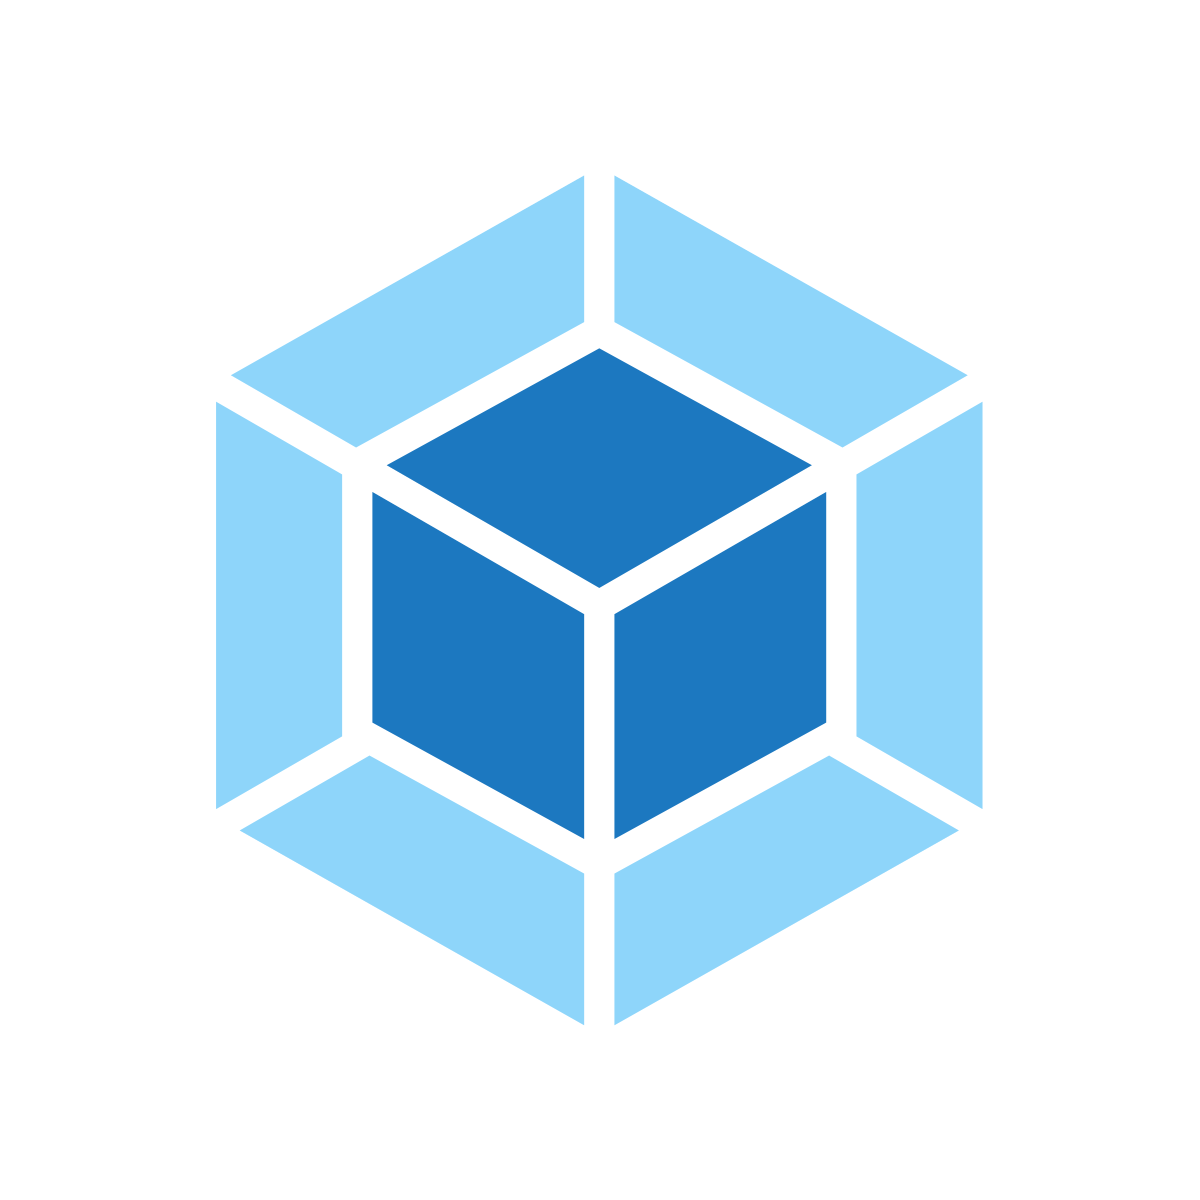 icon square big example